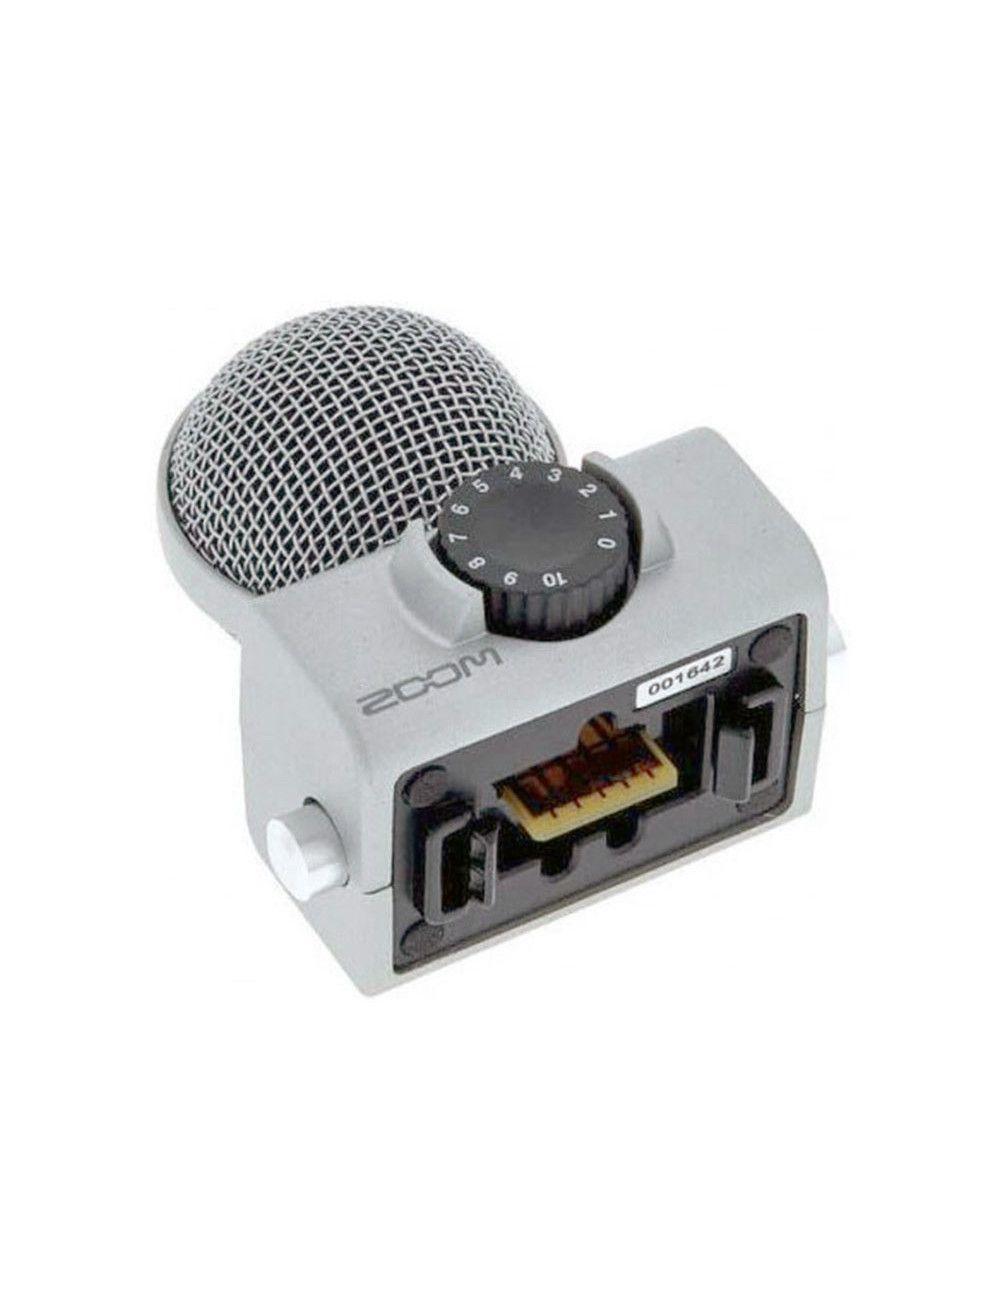 Cargador USB - 220V para Cargadores USB Iluminus